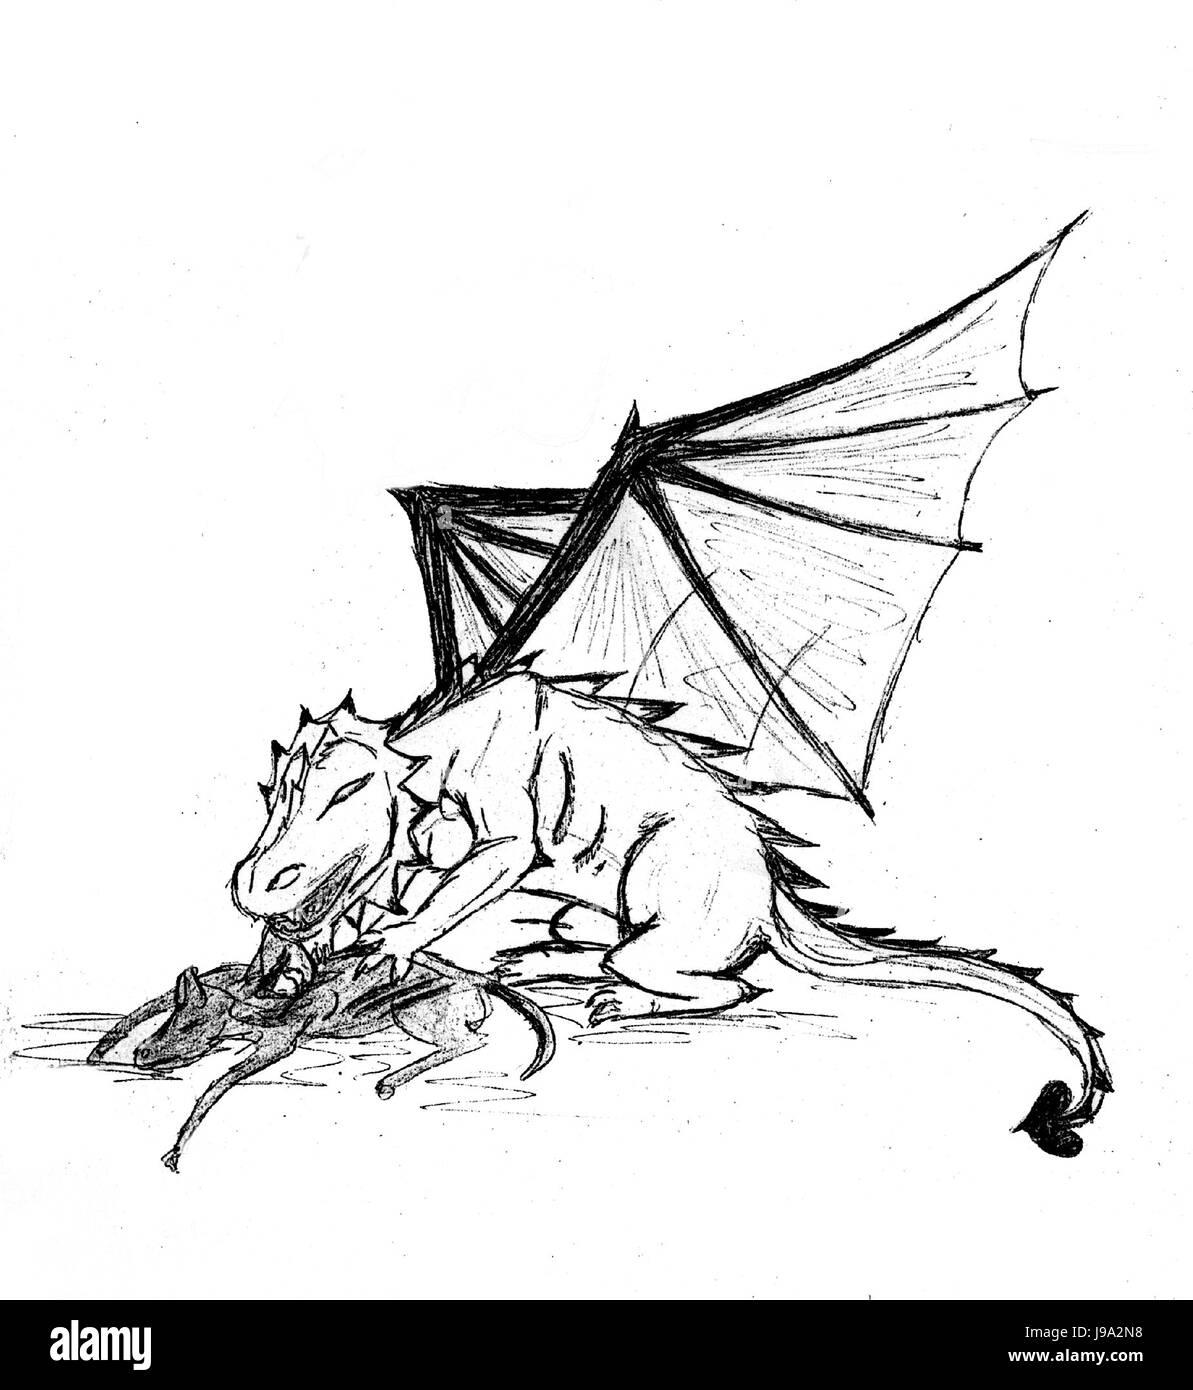 hunter prey to gorge engulf devour dragon drawing